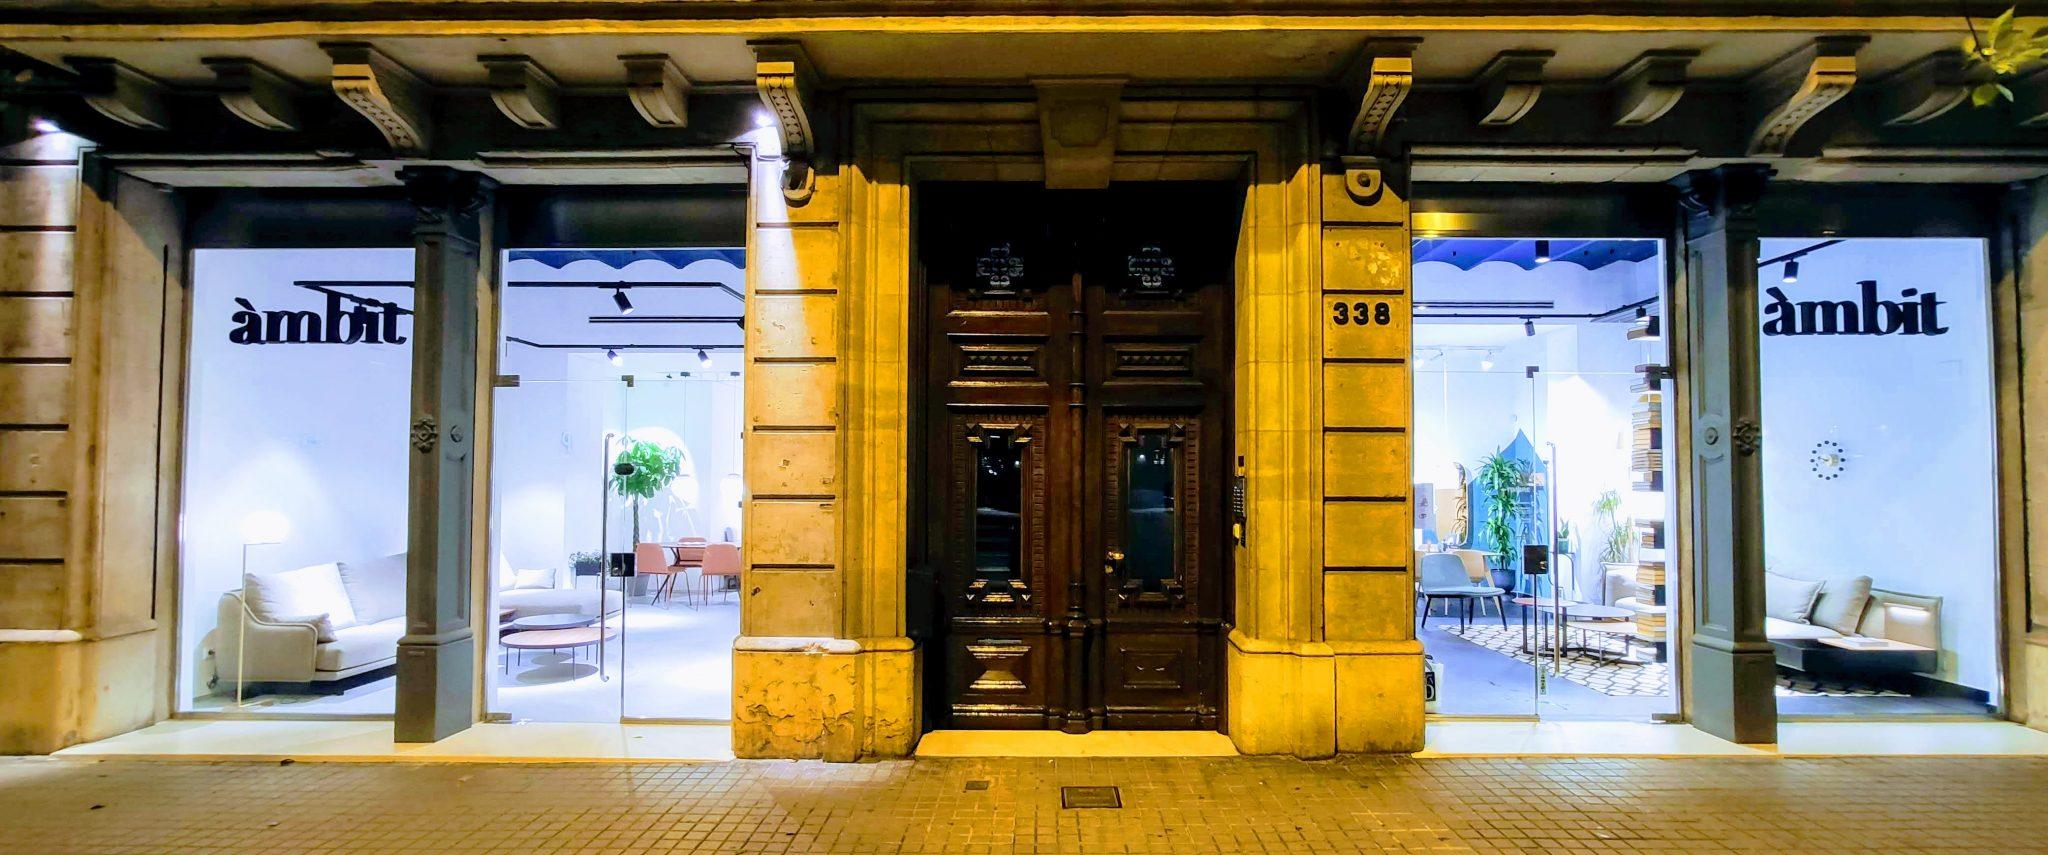 Showrooms en Barcelona: Importantes ideas para inspirar un proyecto showrooms Showrooms en Barcelona: Importantes ideas para inspirar un proyecto IMG 20200716 224053 3 2048x855 1